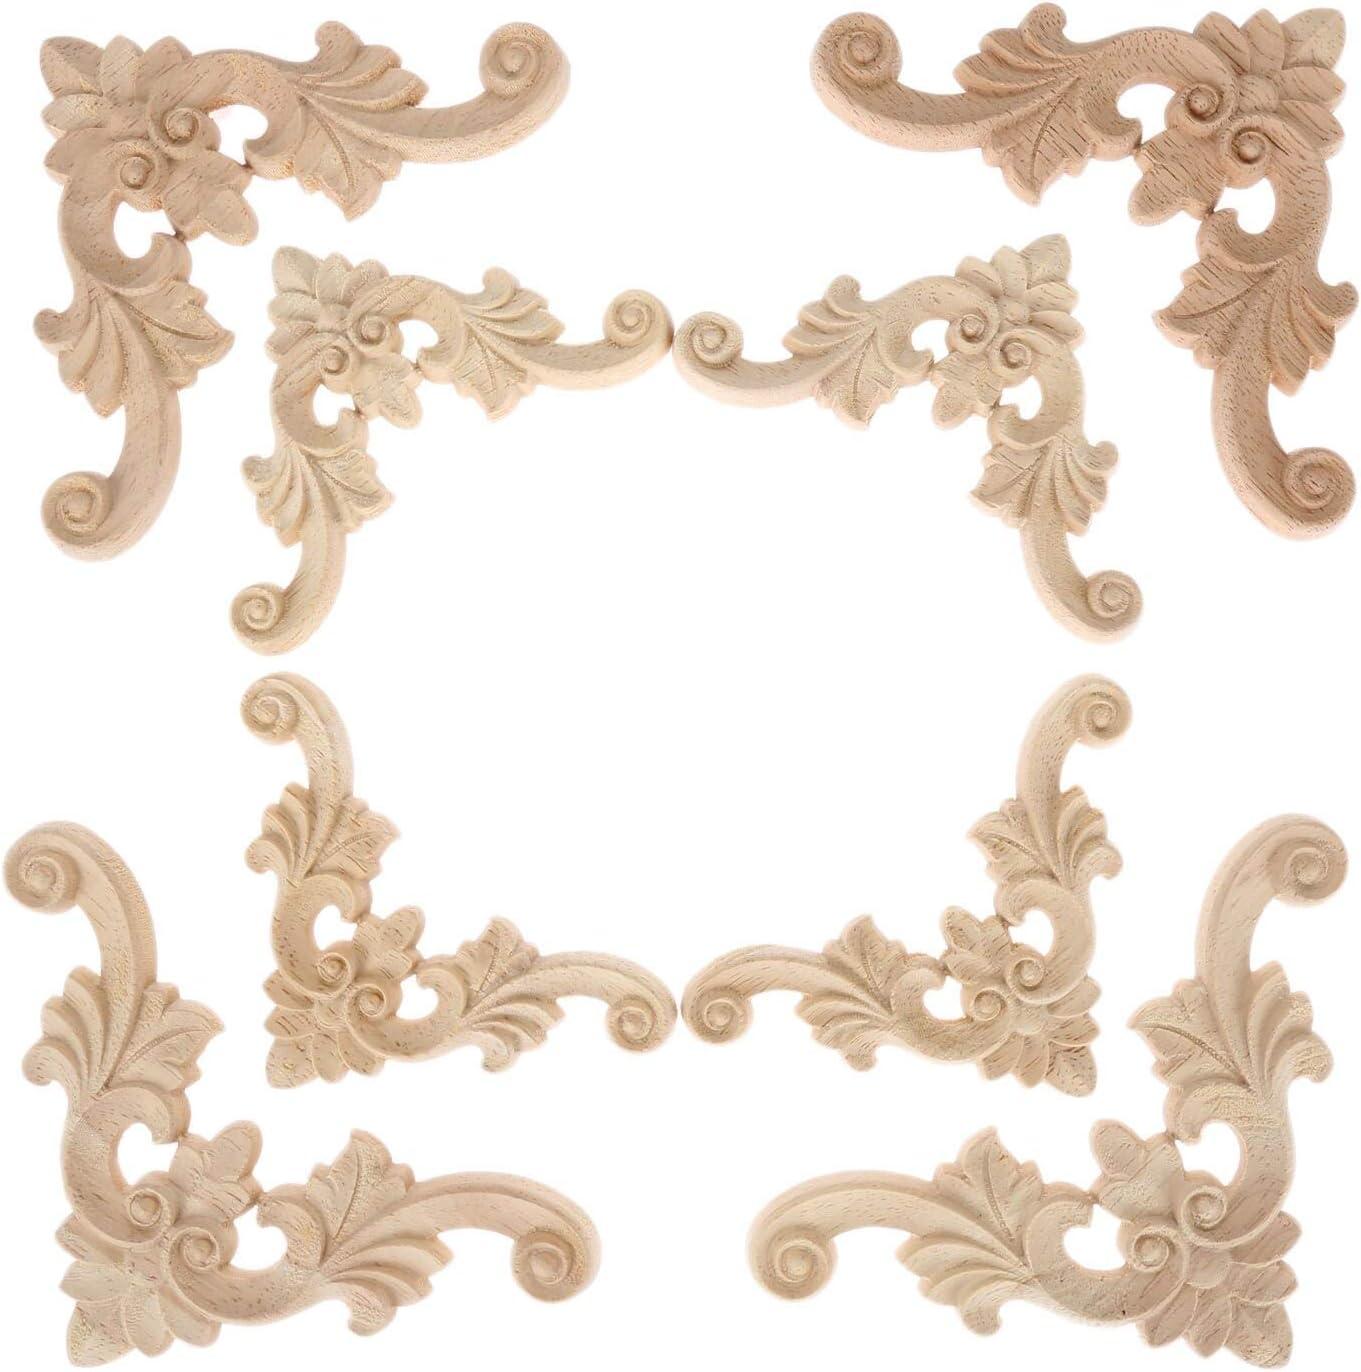 Manufacturer regenerated product Fetcus Superlatite Corner Brackets - 4pcs Woodcarving 110mm C Decal Applique